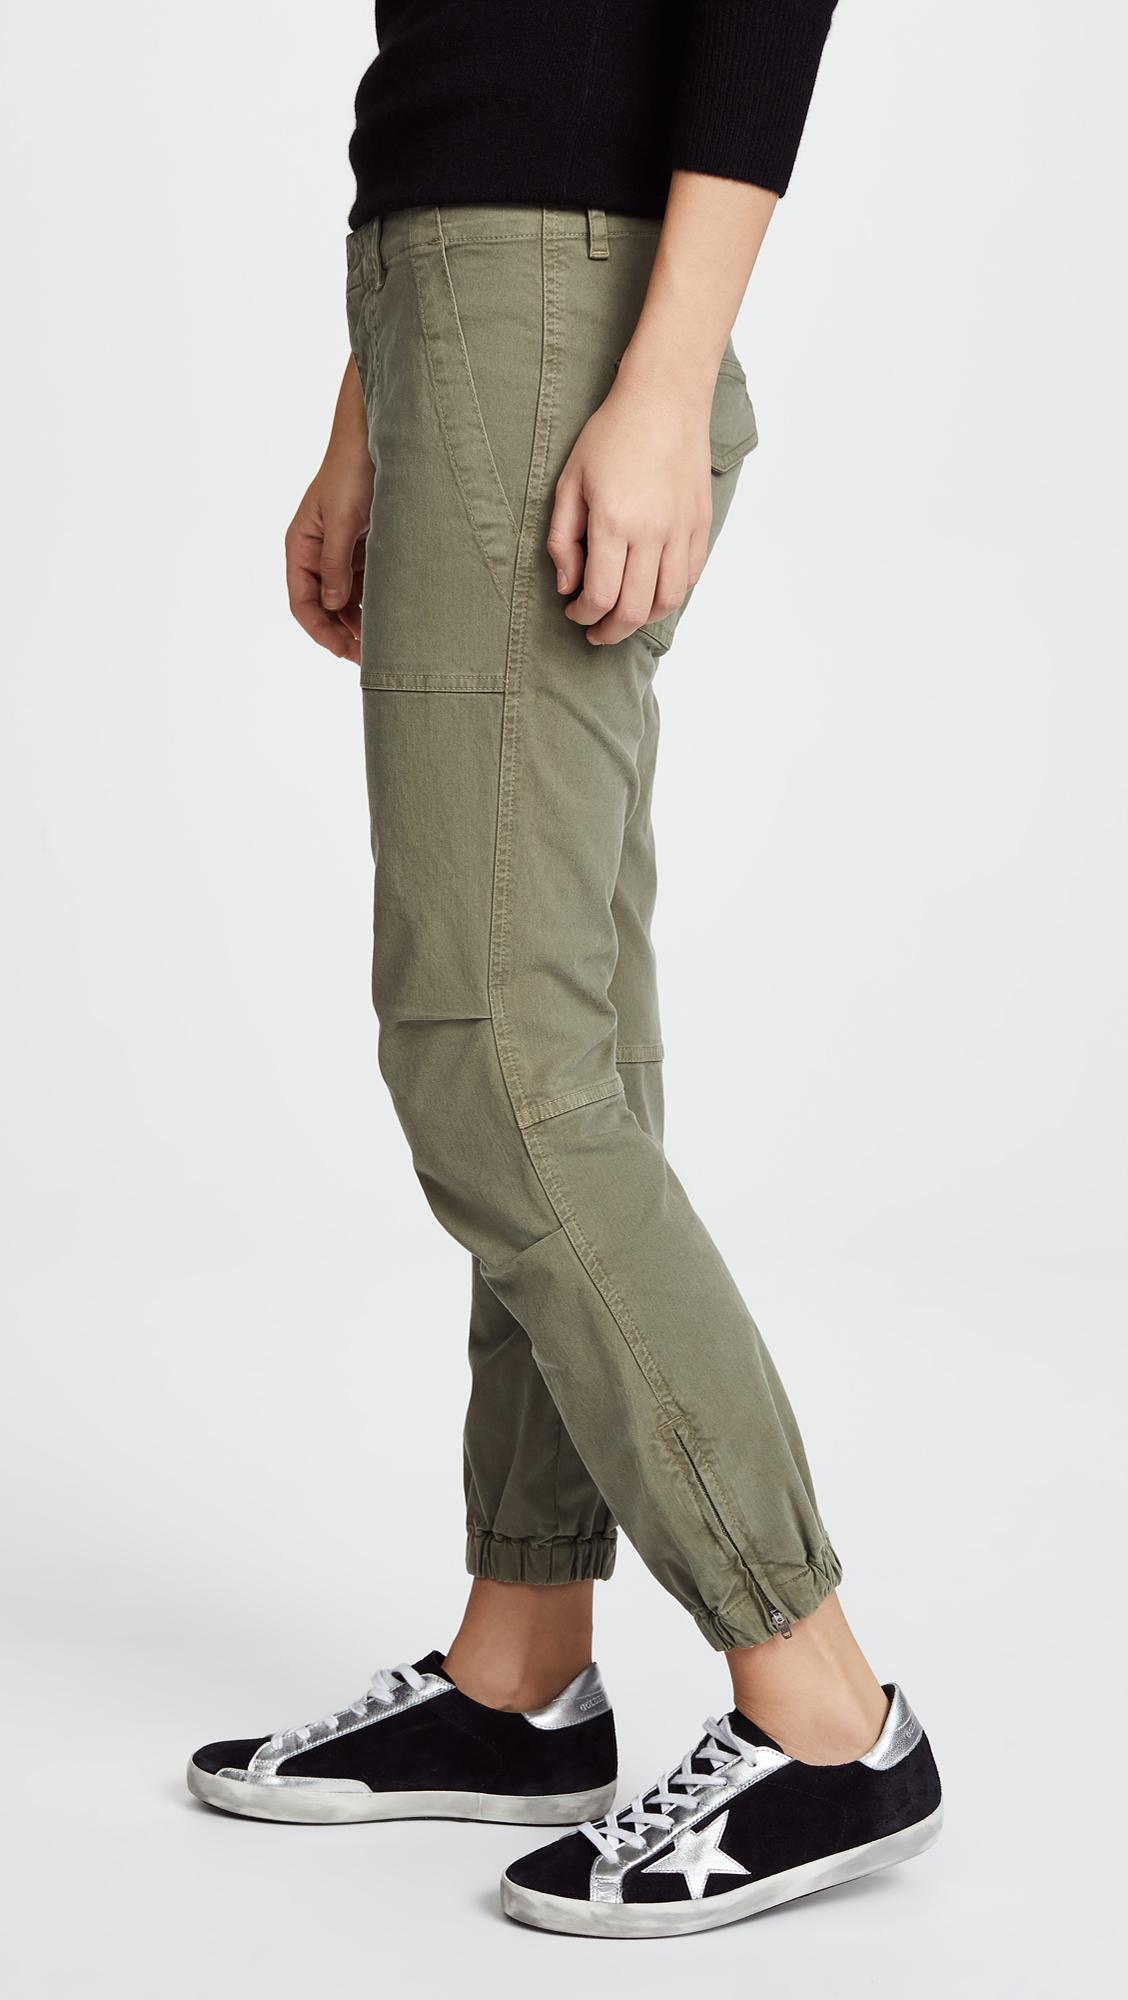 franceses cargo cultivo de militar Nili para Lotan Pantalones mujer qACa1wC